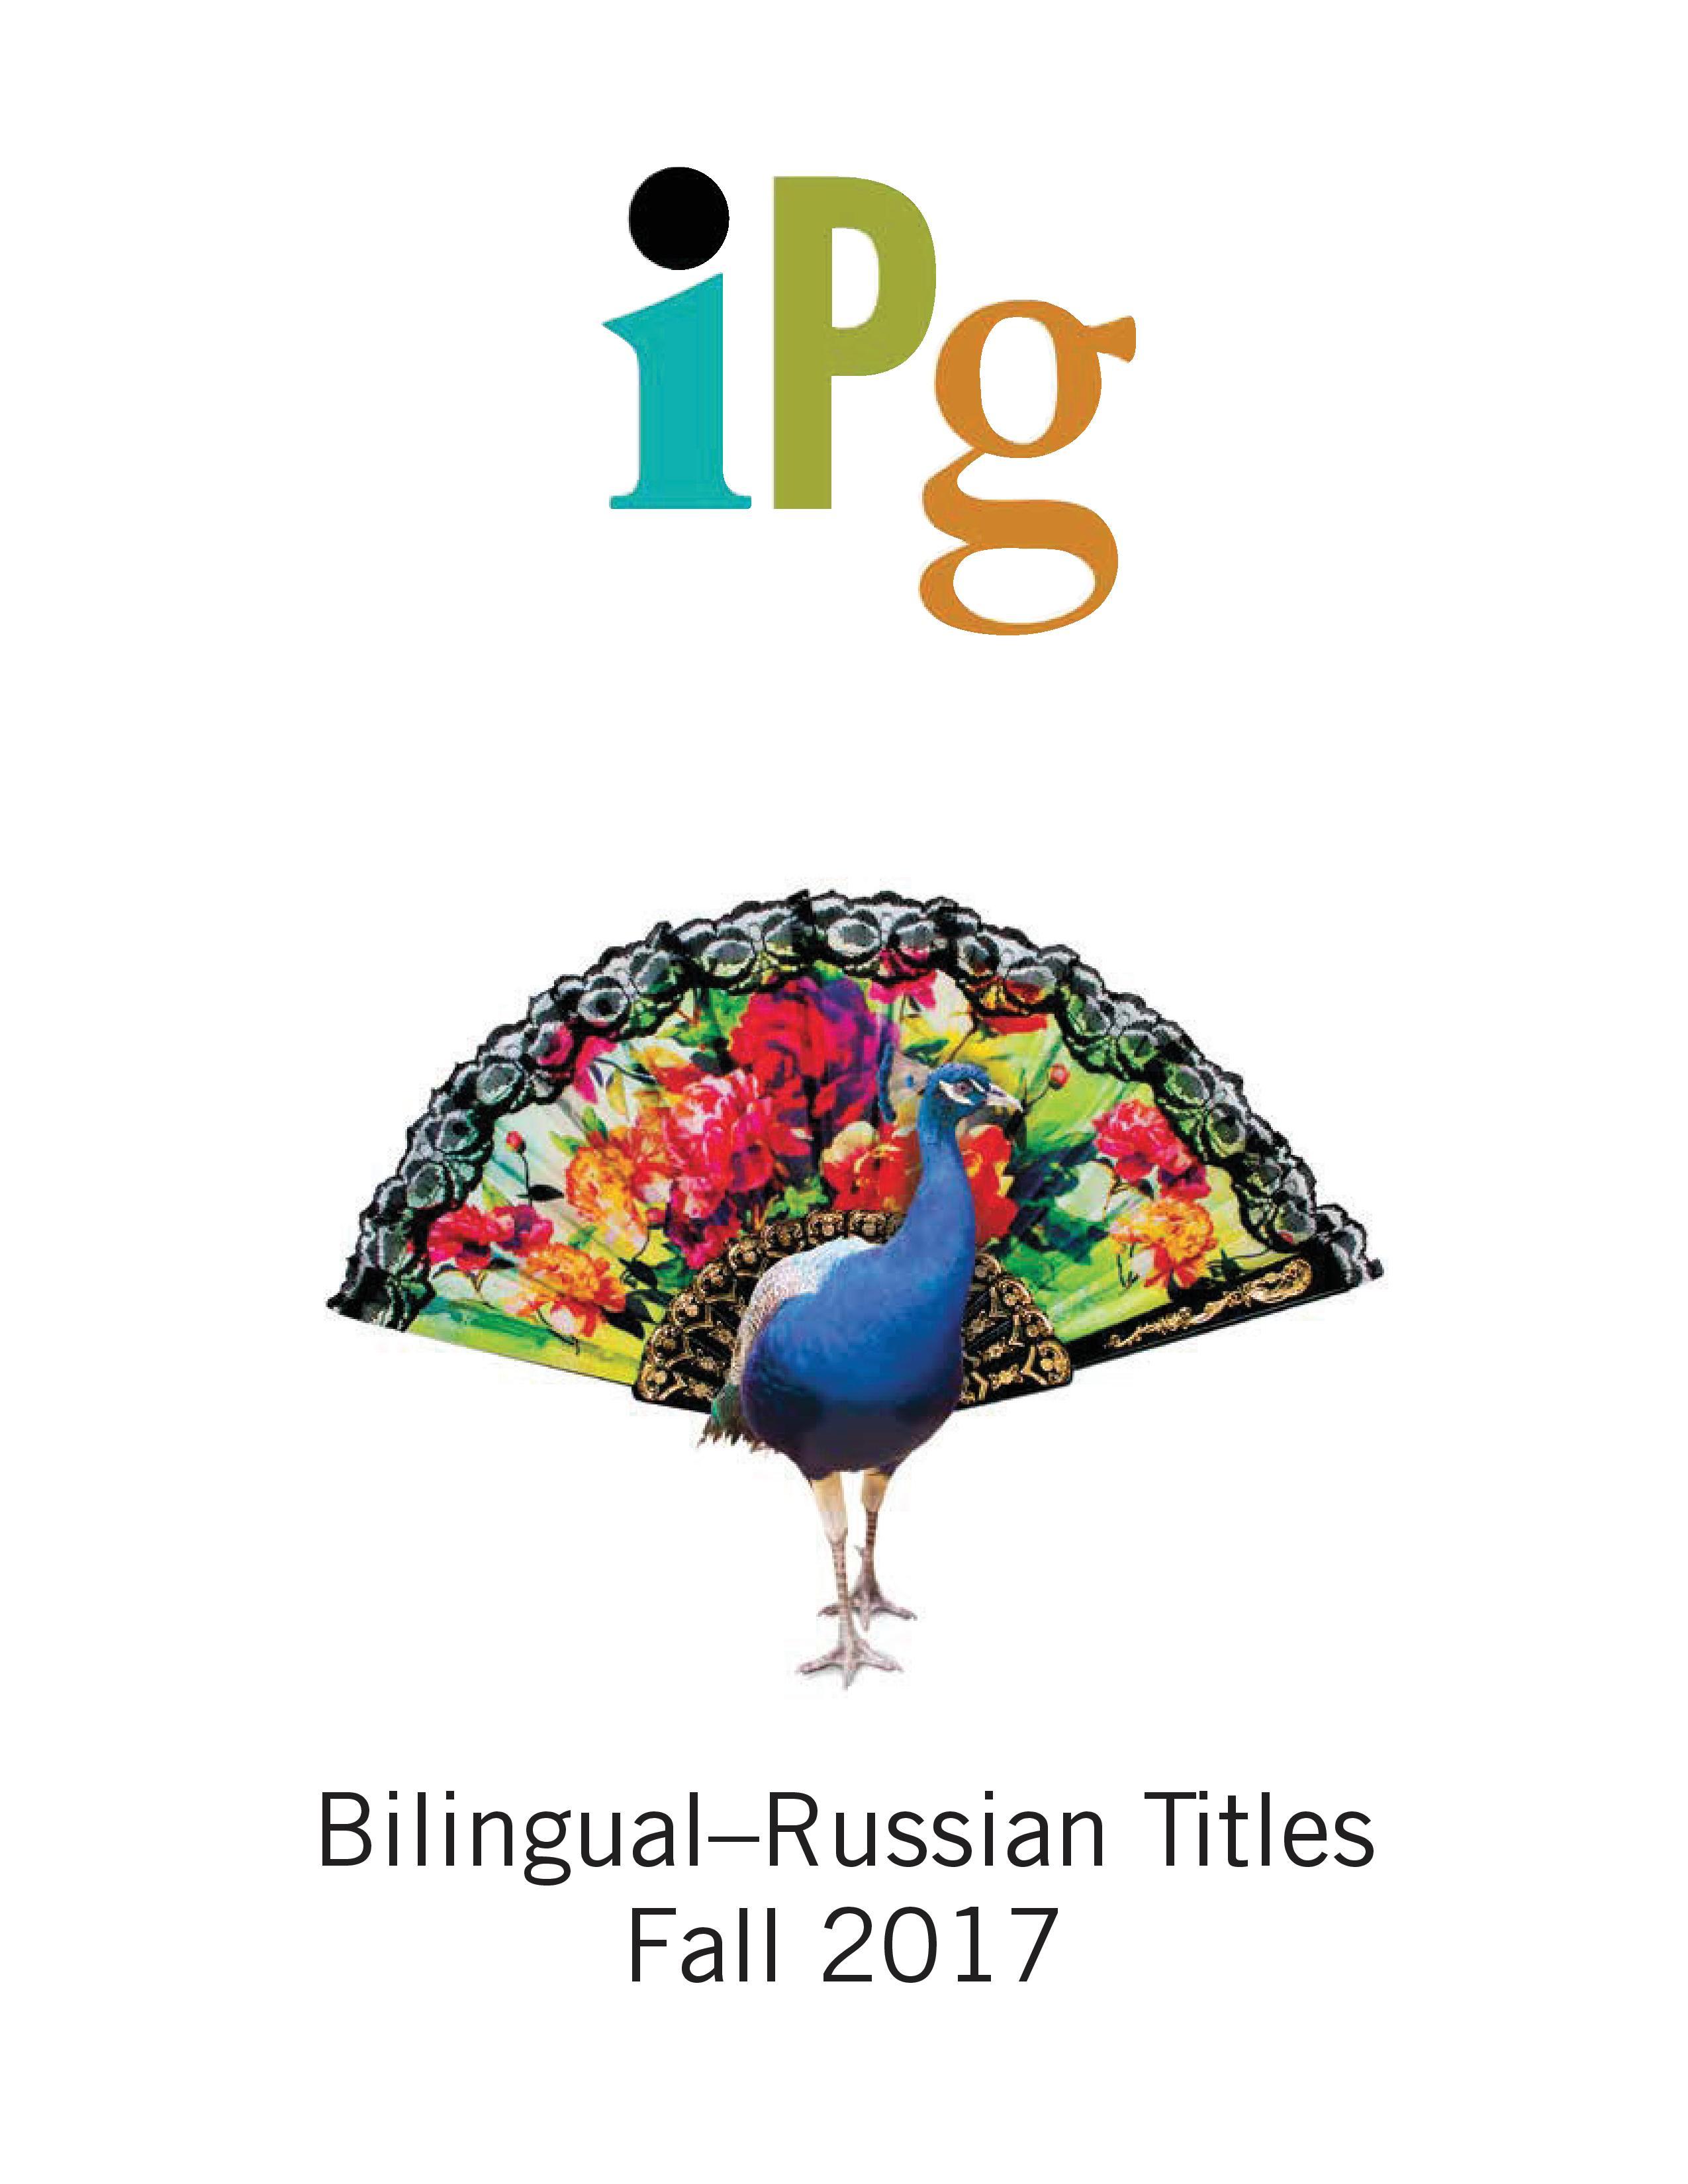 Bilingual Russian Titles